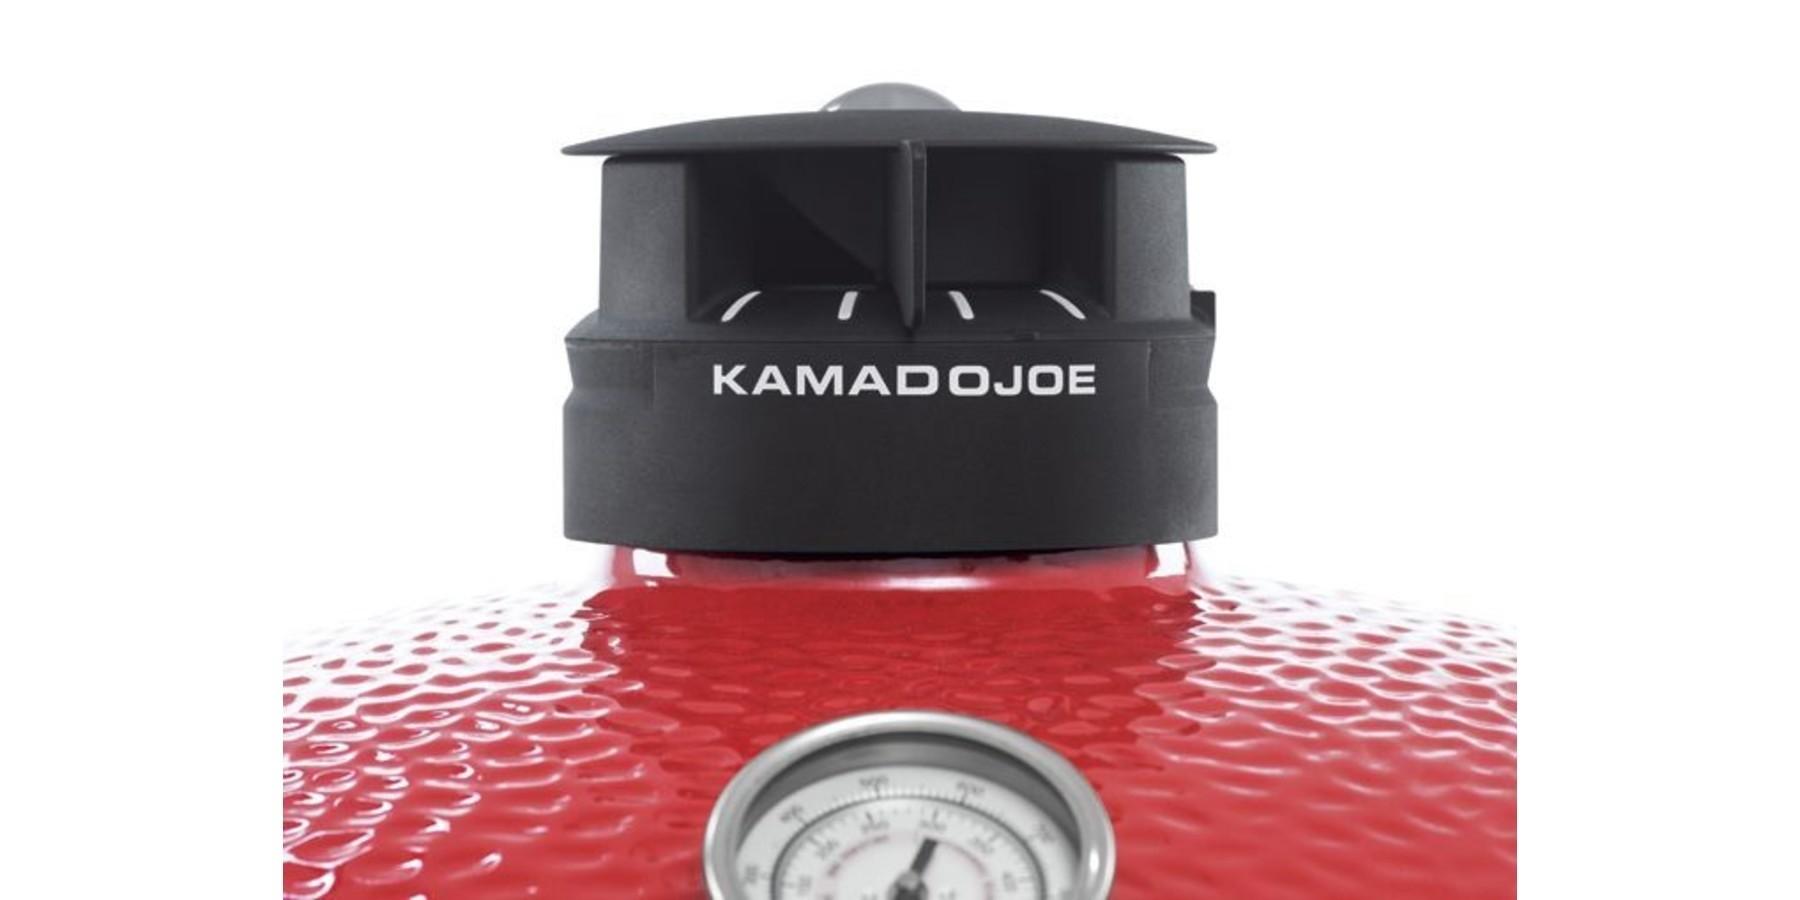 Kamado Joe ® Big Joe - PRE-ORDER NOW !